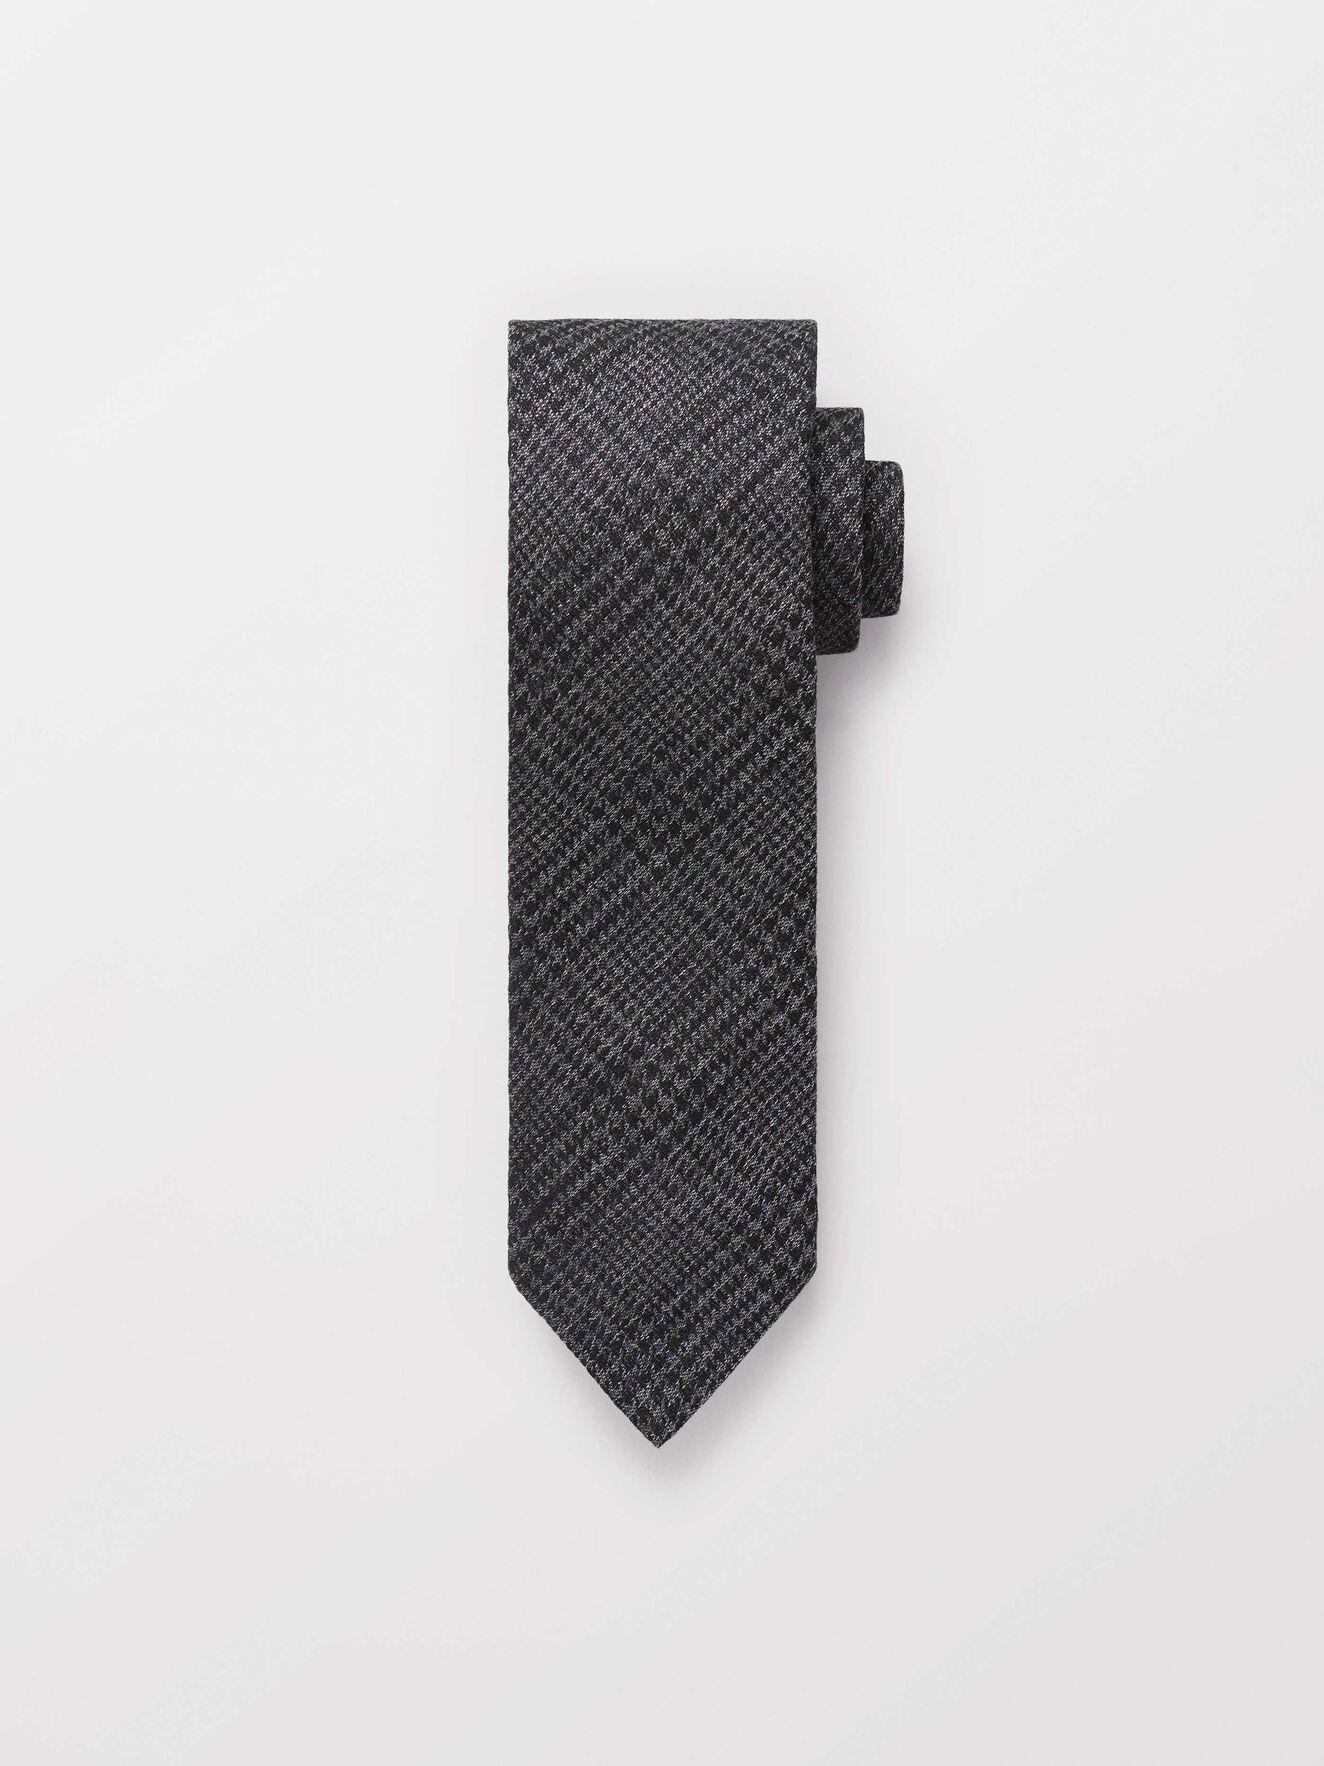 Tornan Krawatte in Charcoal from Tiger of Sweden